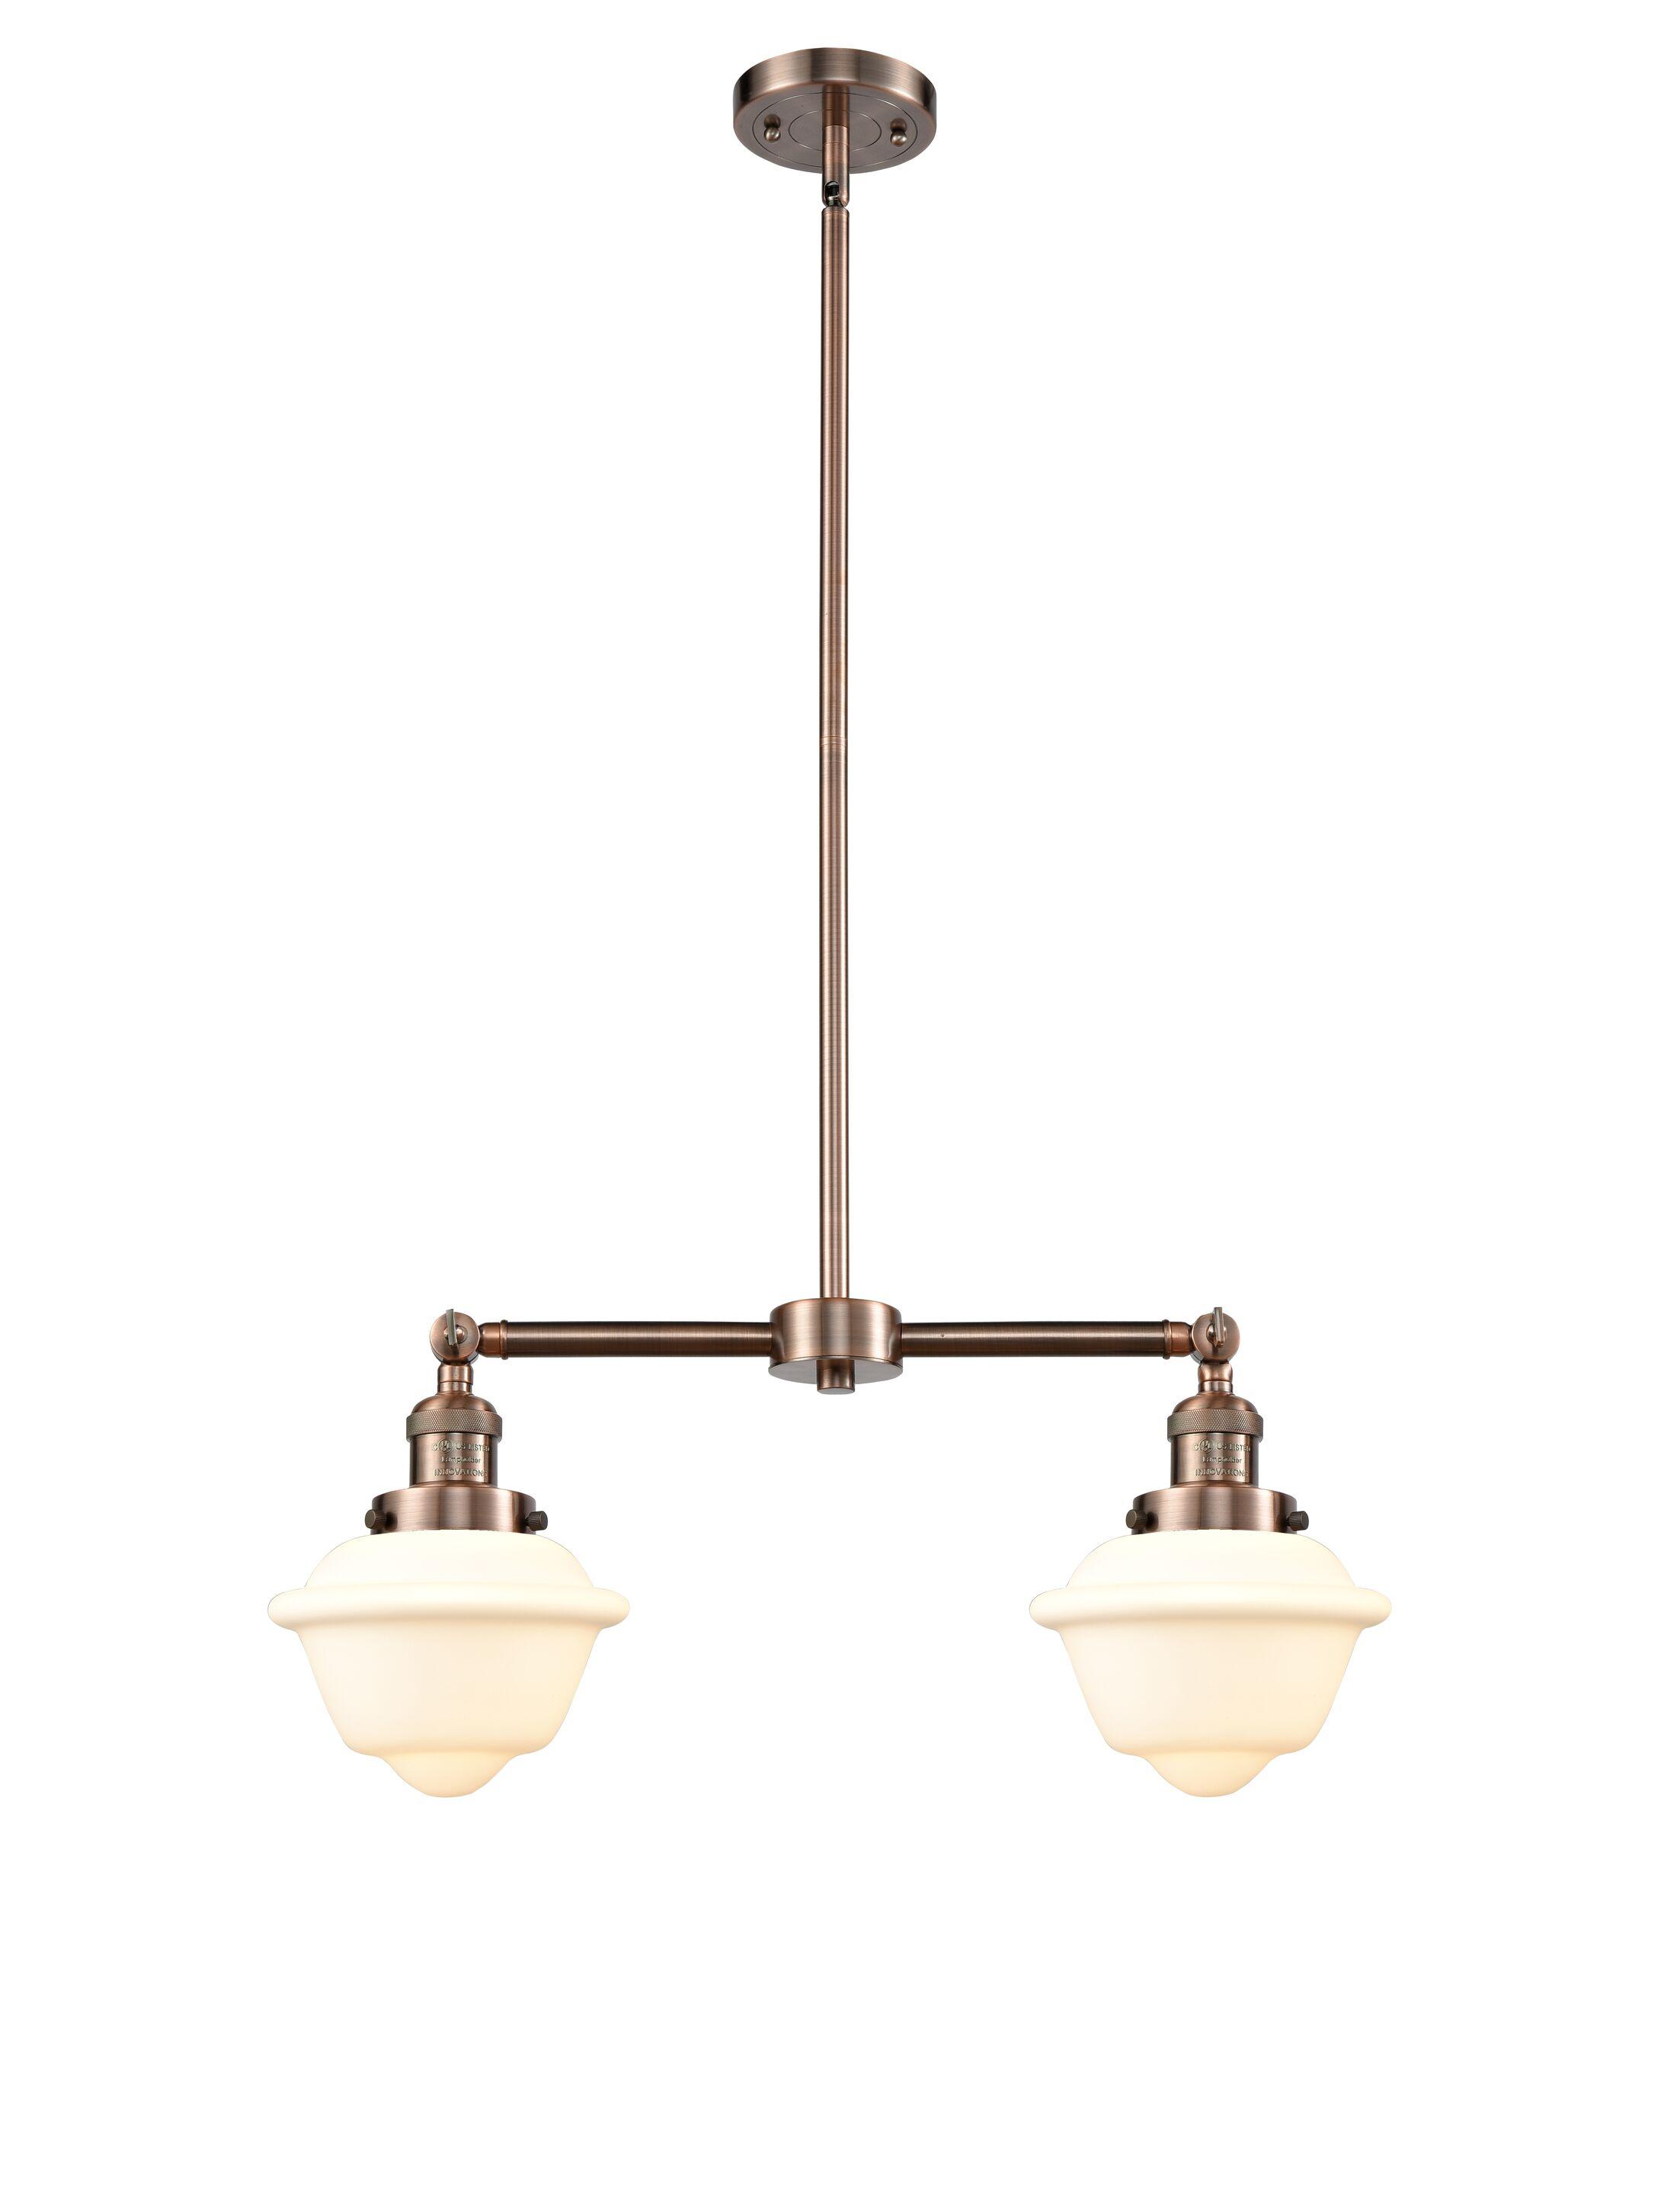 Calliope 2-Light Kitchen Island Pendant Bulb Type: Incandescent, Shade Color: Clear, Finish: Antique Copper